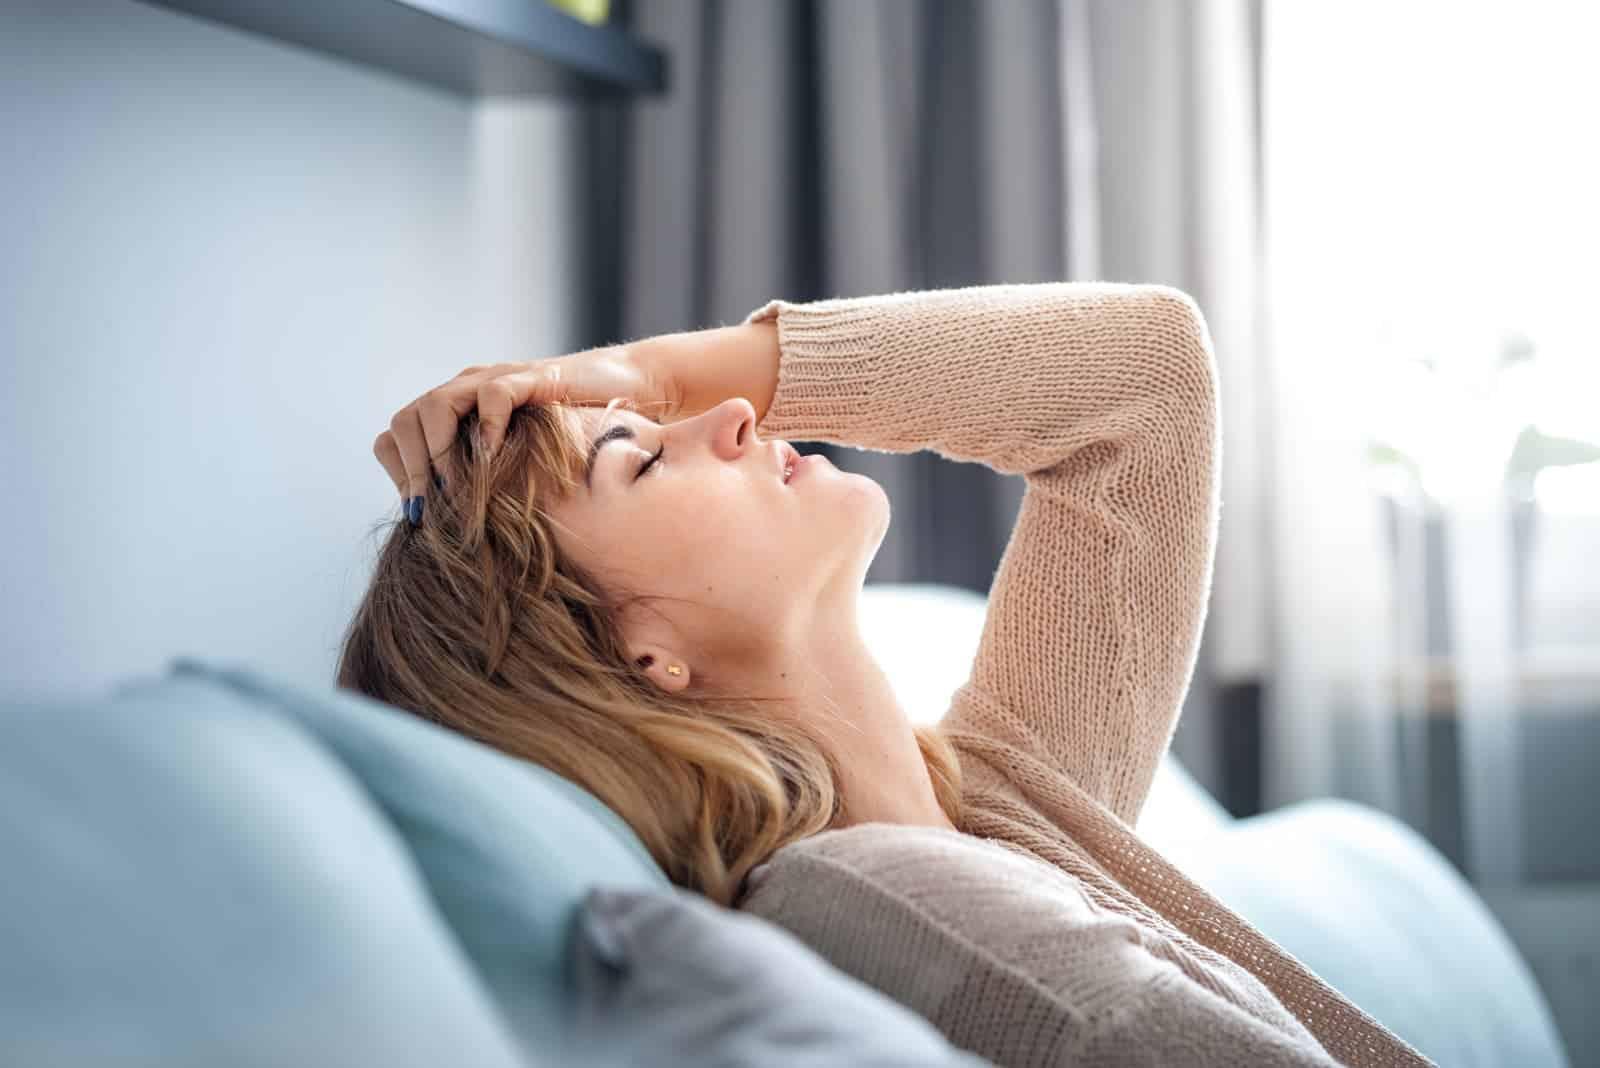 a depressed woman sitting on a sofa